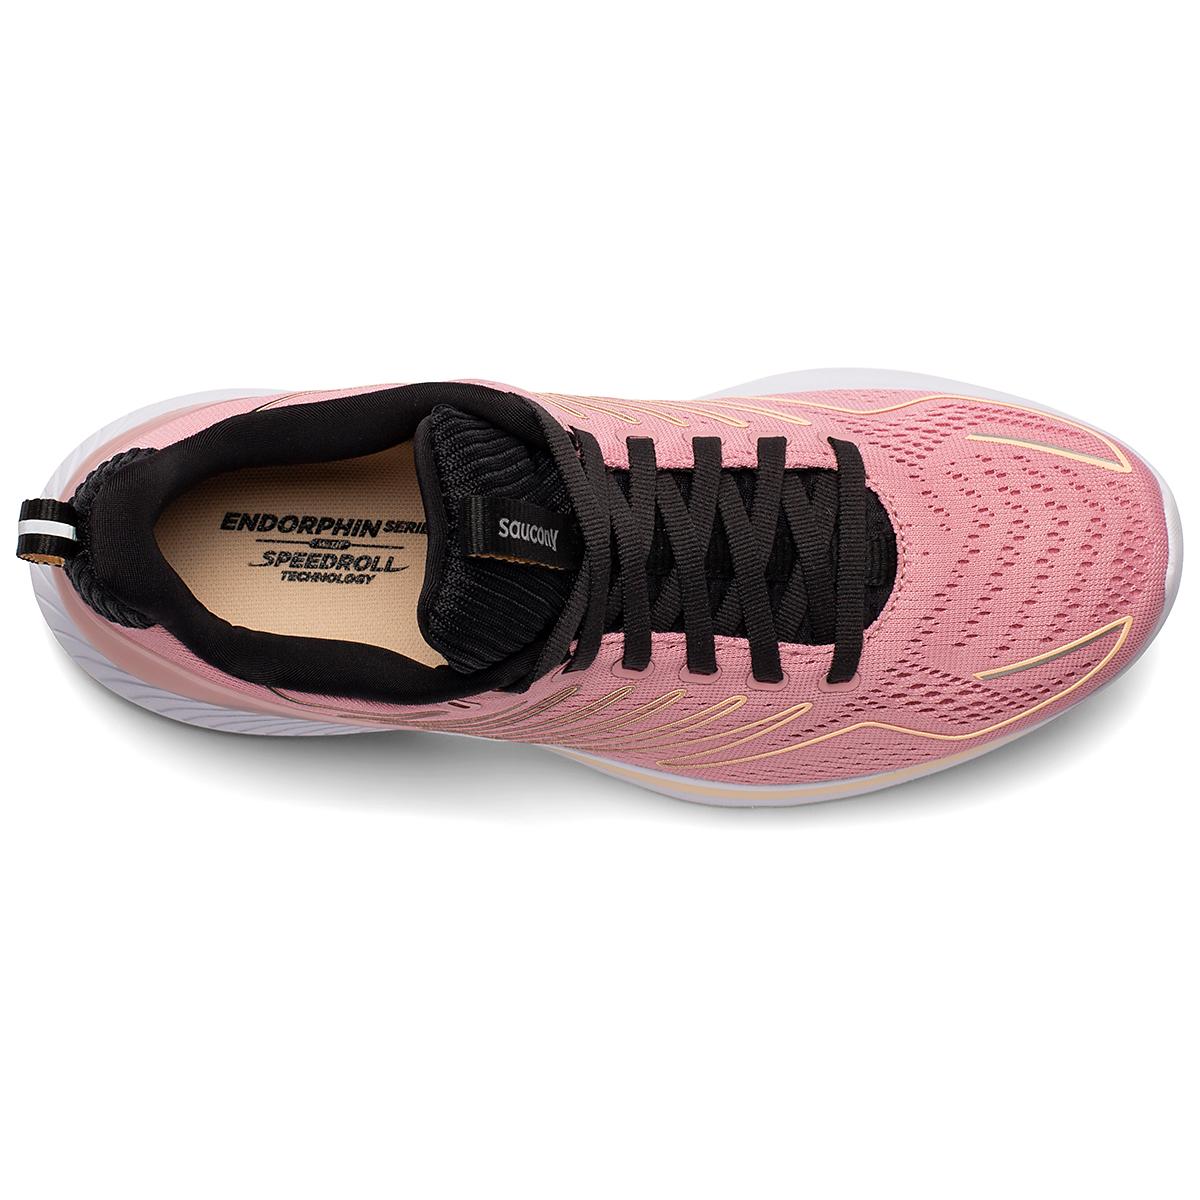 Women's Saucony Endorphin Shift Running Shoe - Color: Rosewater/Black - Size: 5 - Width: Regular, Rosewater/Black, large, image 4